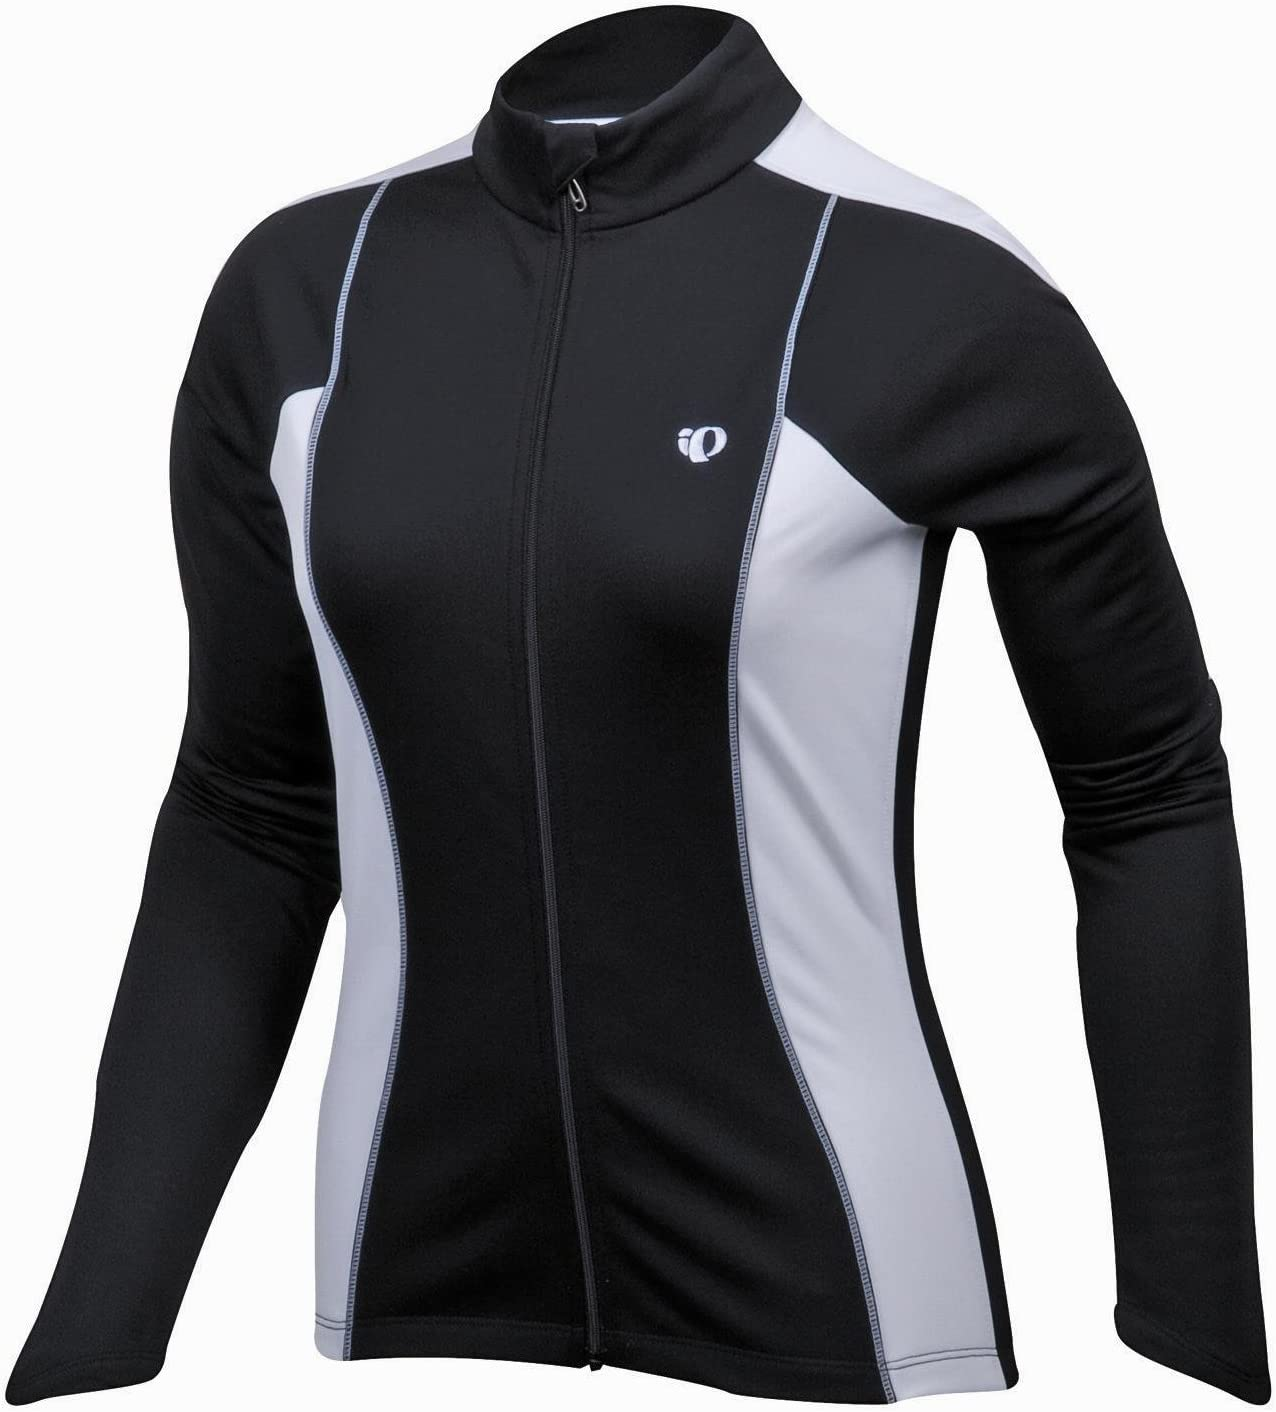 Philadelphia Mall Max 49% OFF Pearl iZUMi Women's Jacket Launch Cycling